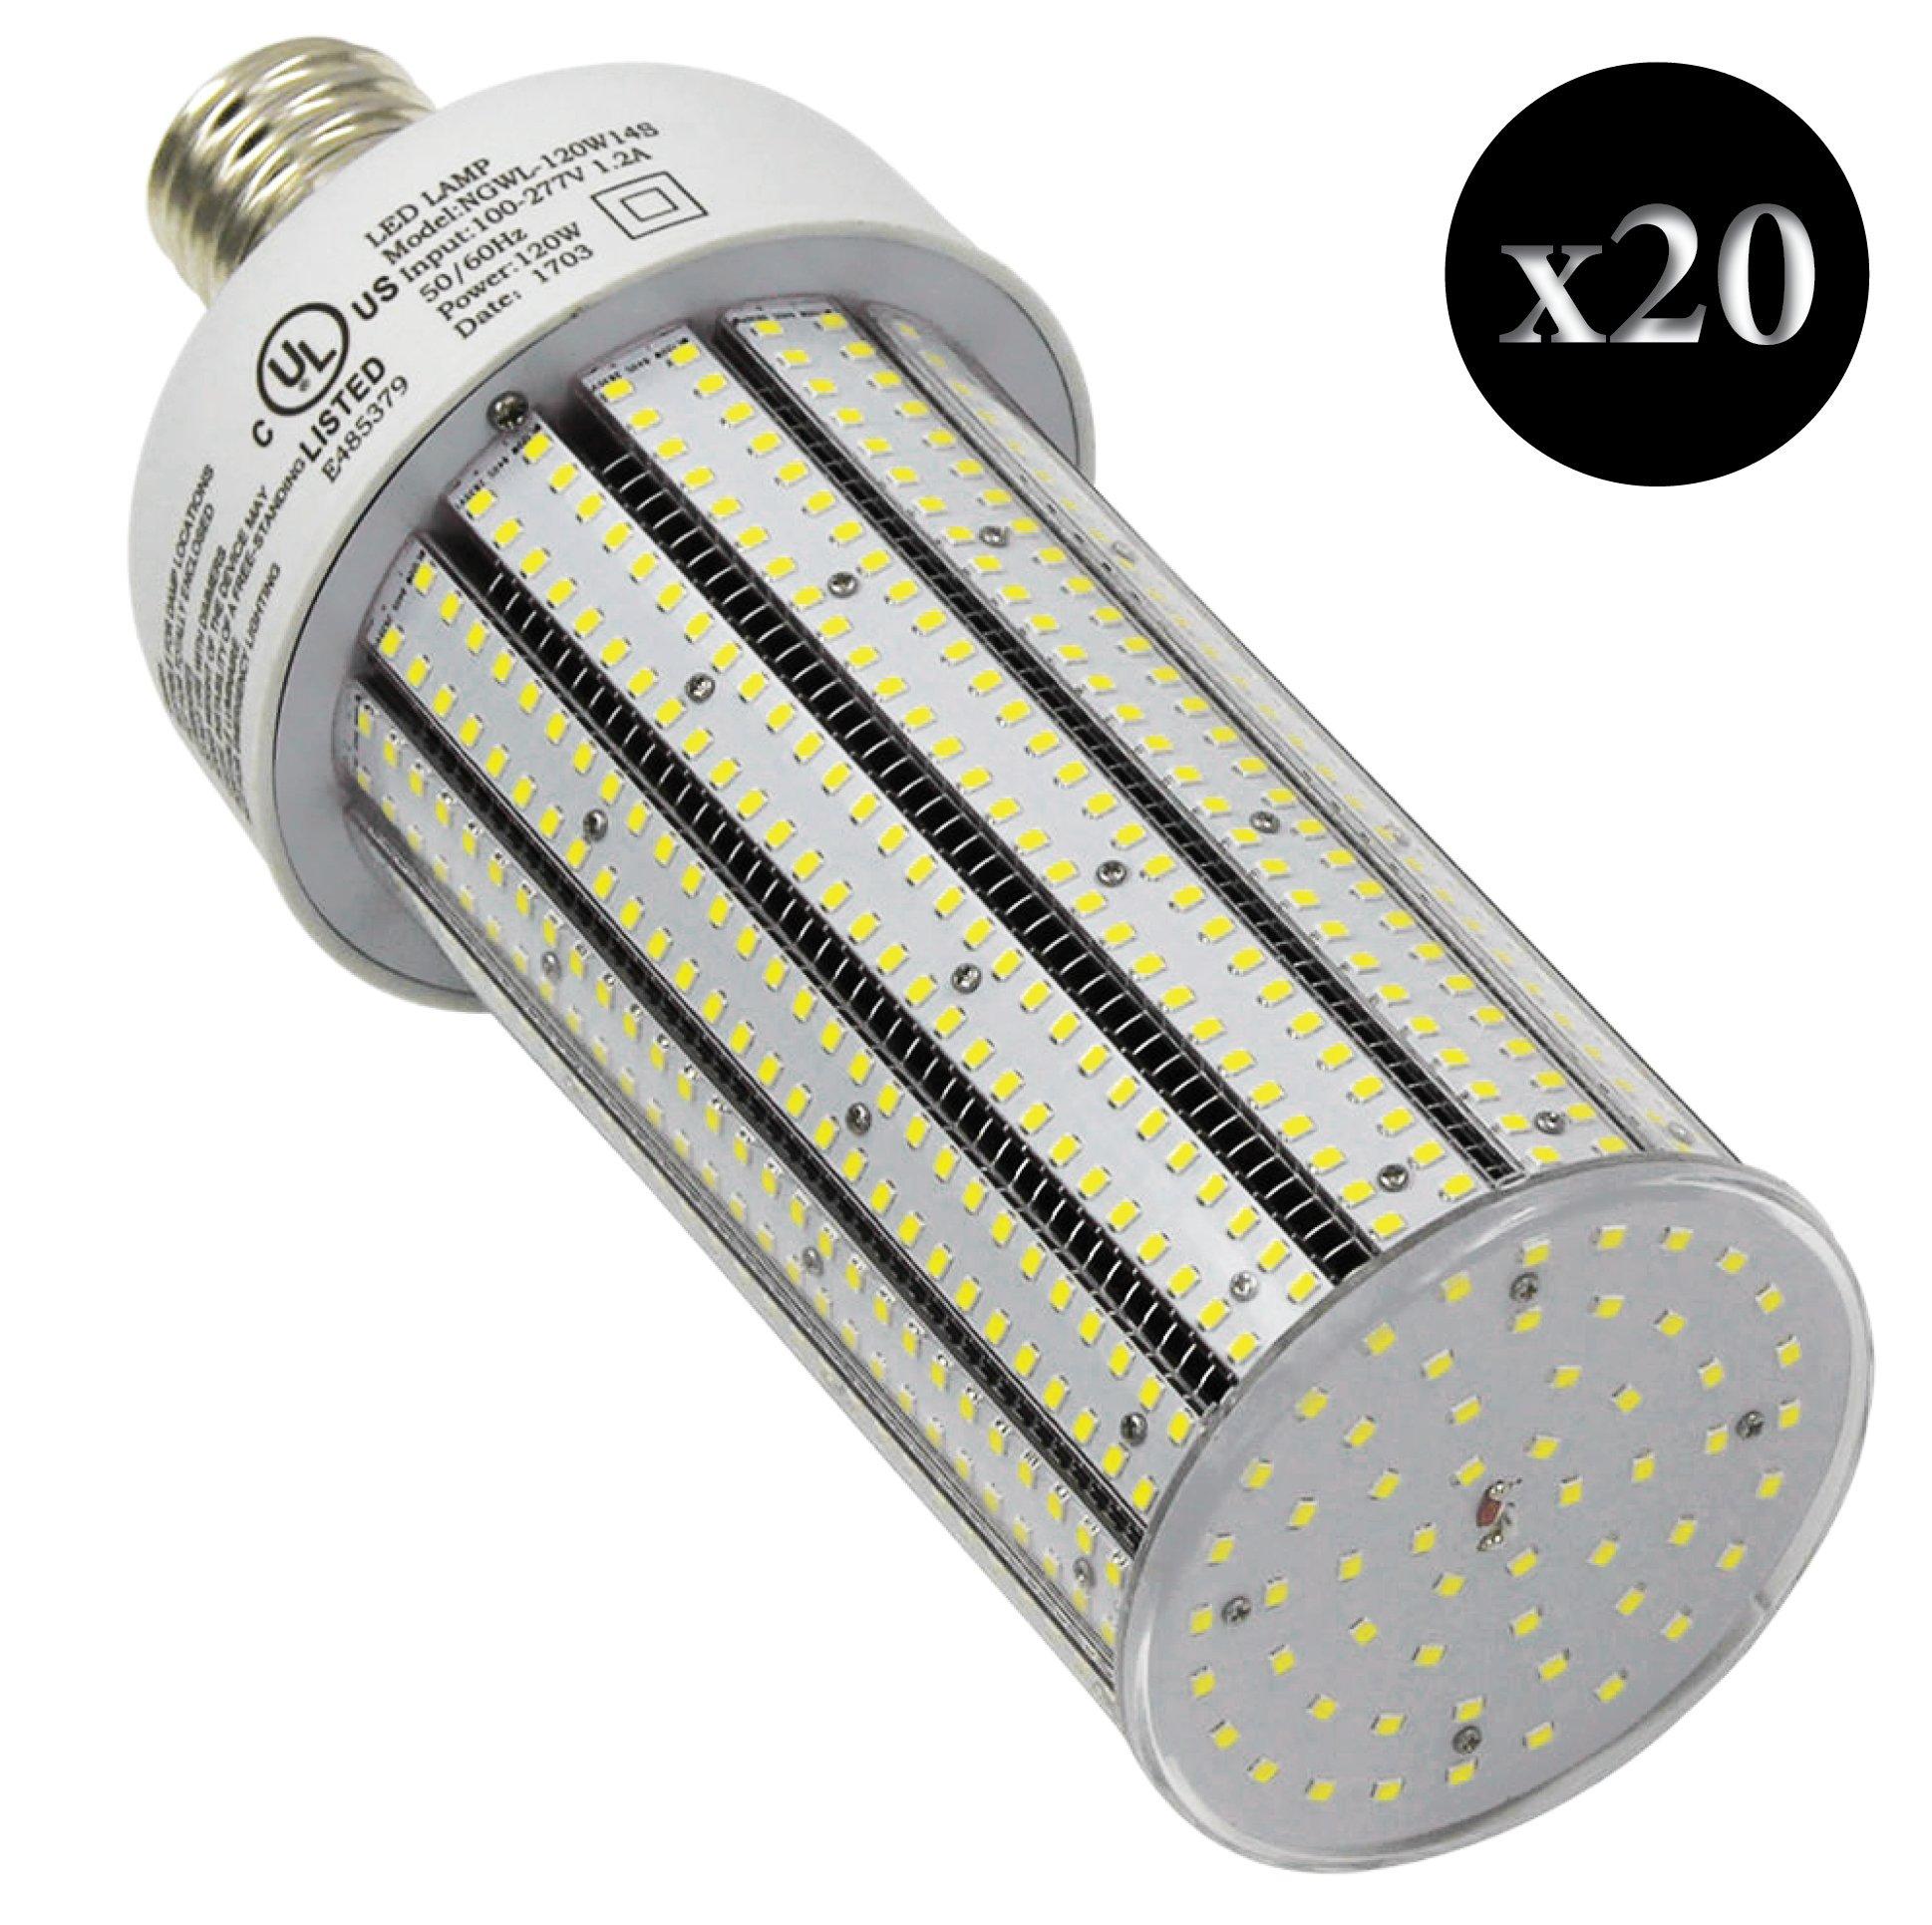 QTY 20 CC120-39 LED HIGH BAY SPORTS ARENA POST LED LIGHT E39 6500K WHITE 120W (EQUIVALENT TO 720W)